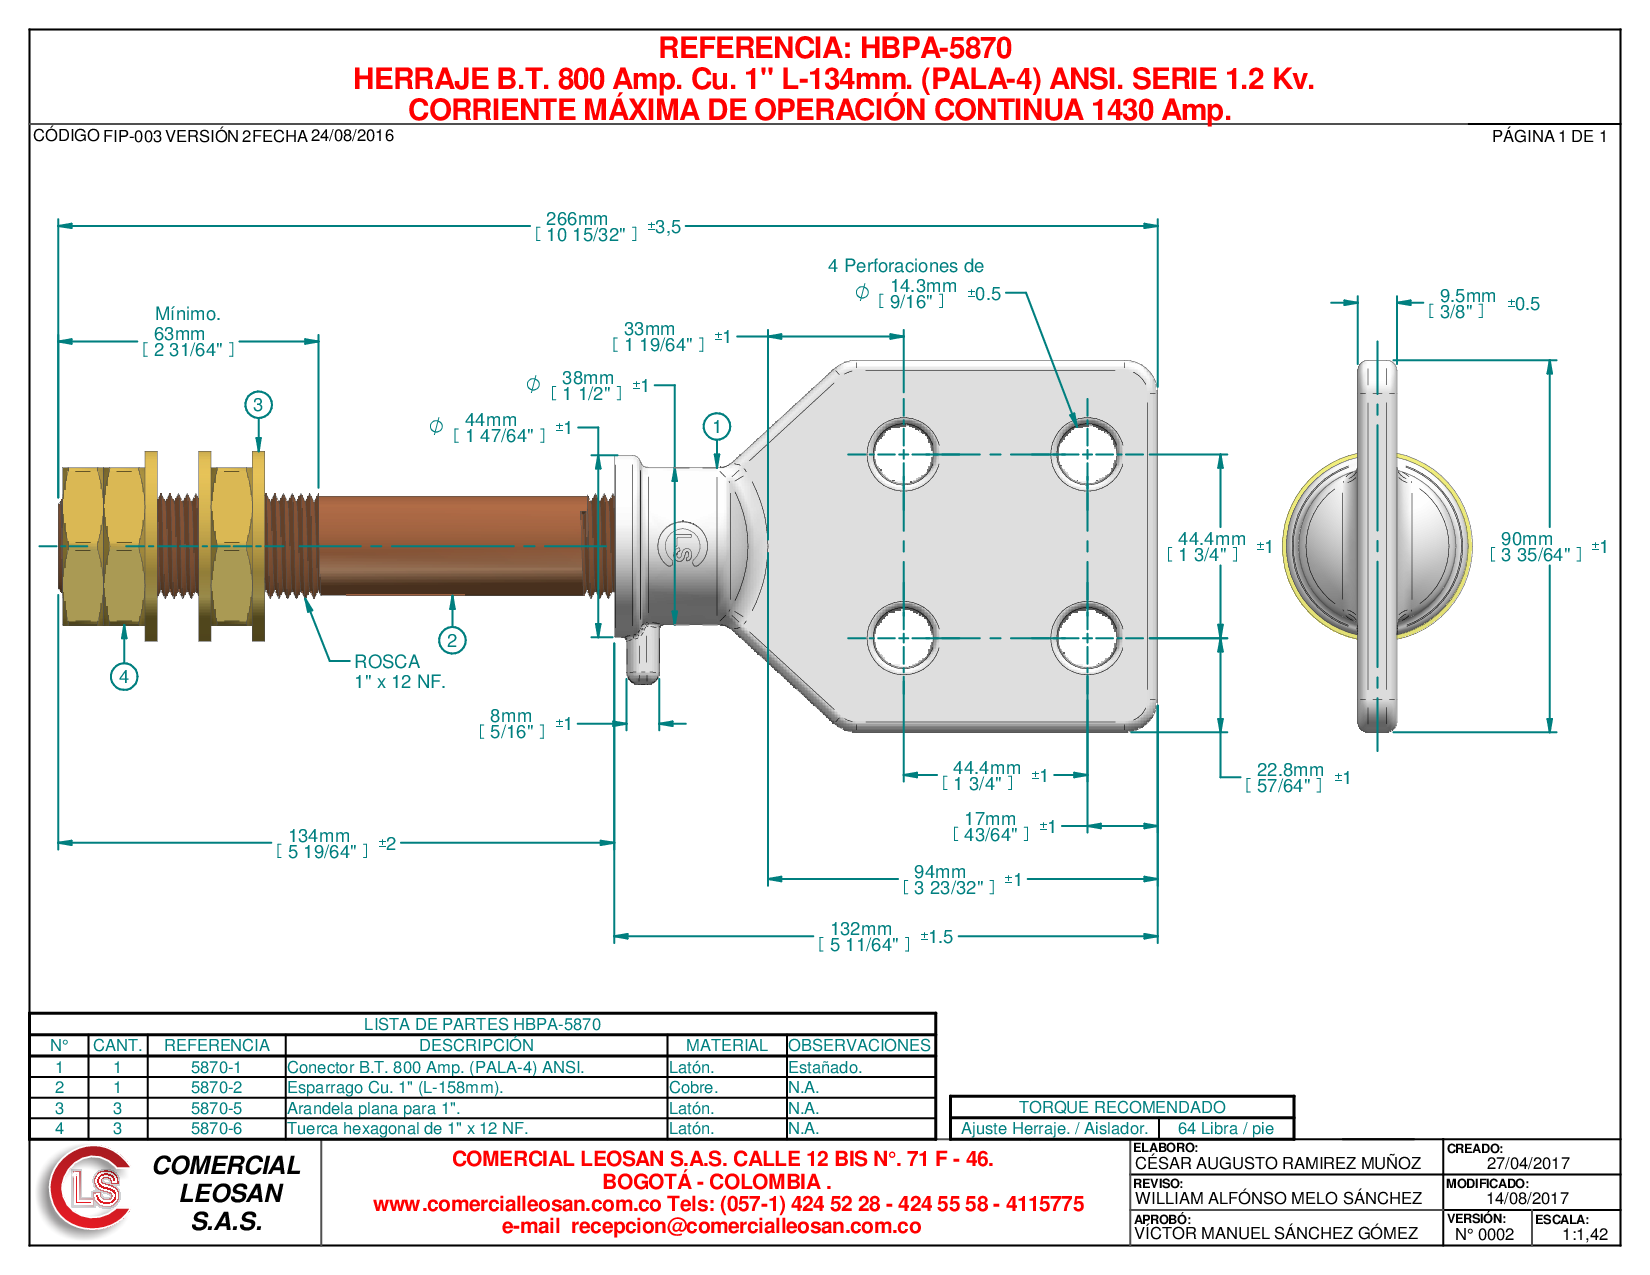 "HERRAJE B.T. 800 Amp. Cu. 1"" L-134mm. (PALA-4) ANSI. SERIE 1.2 Kv."